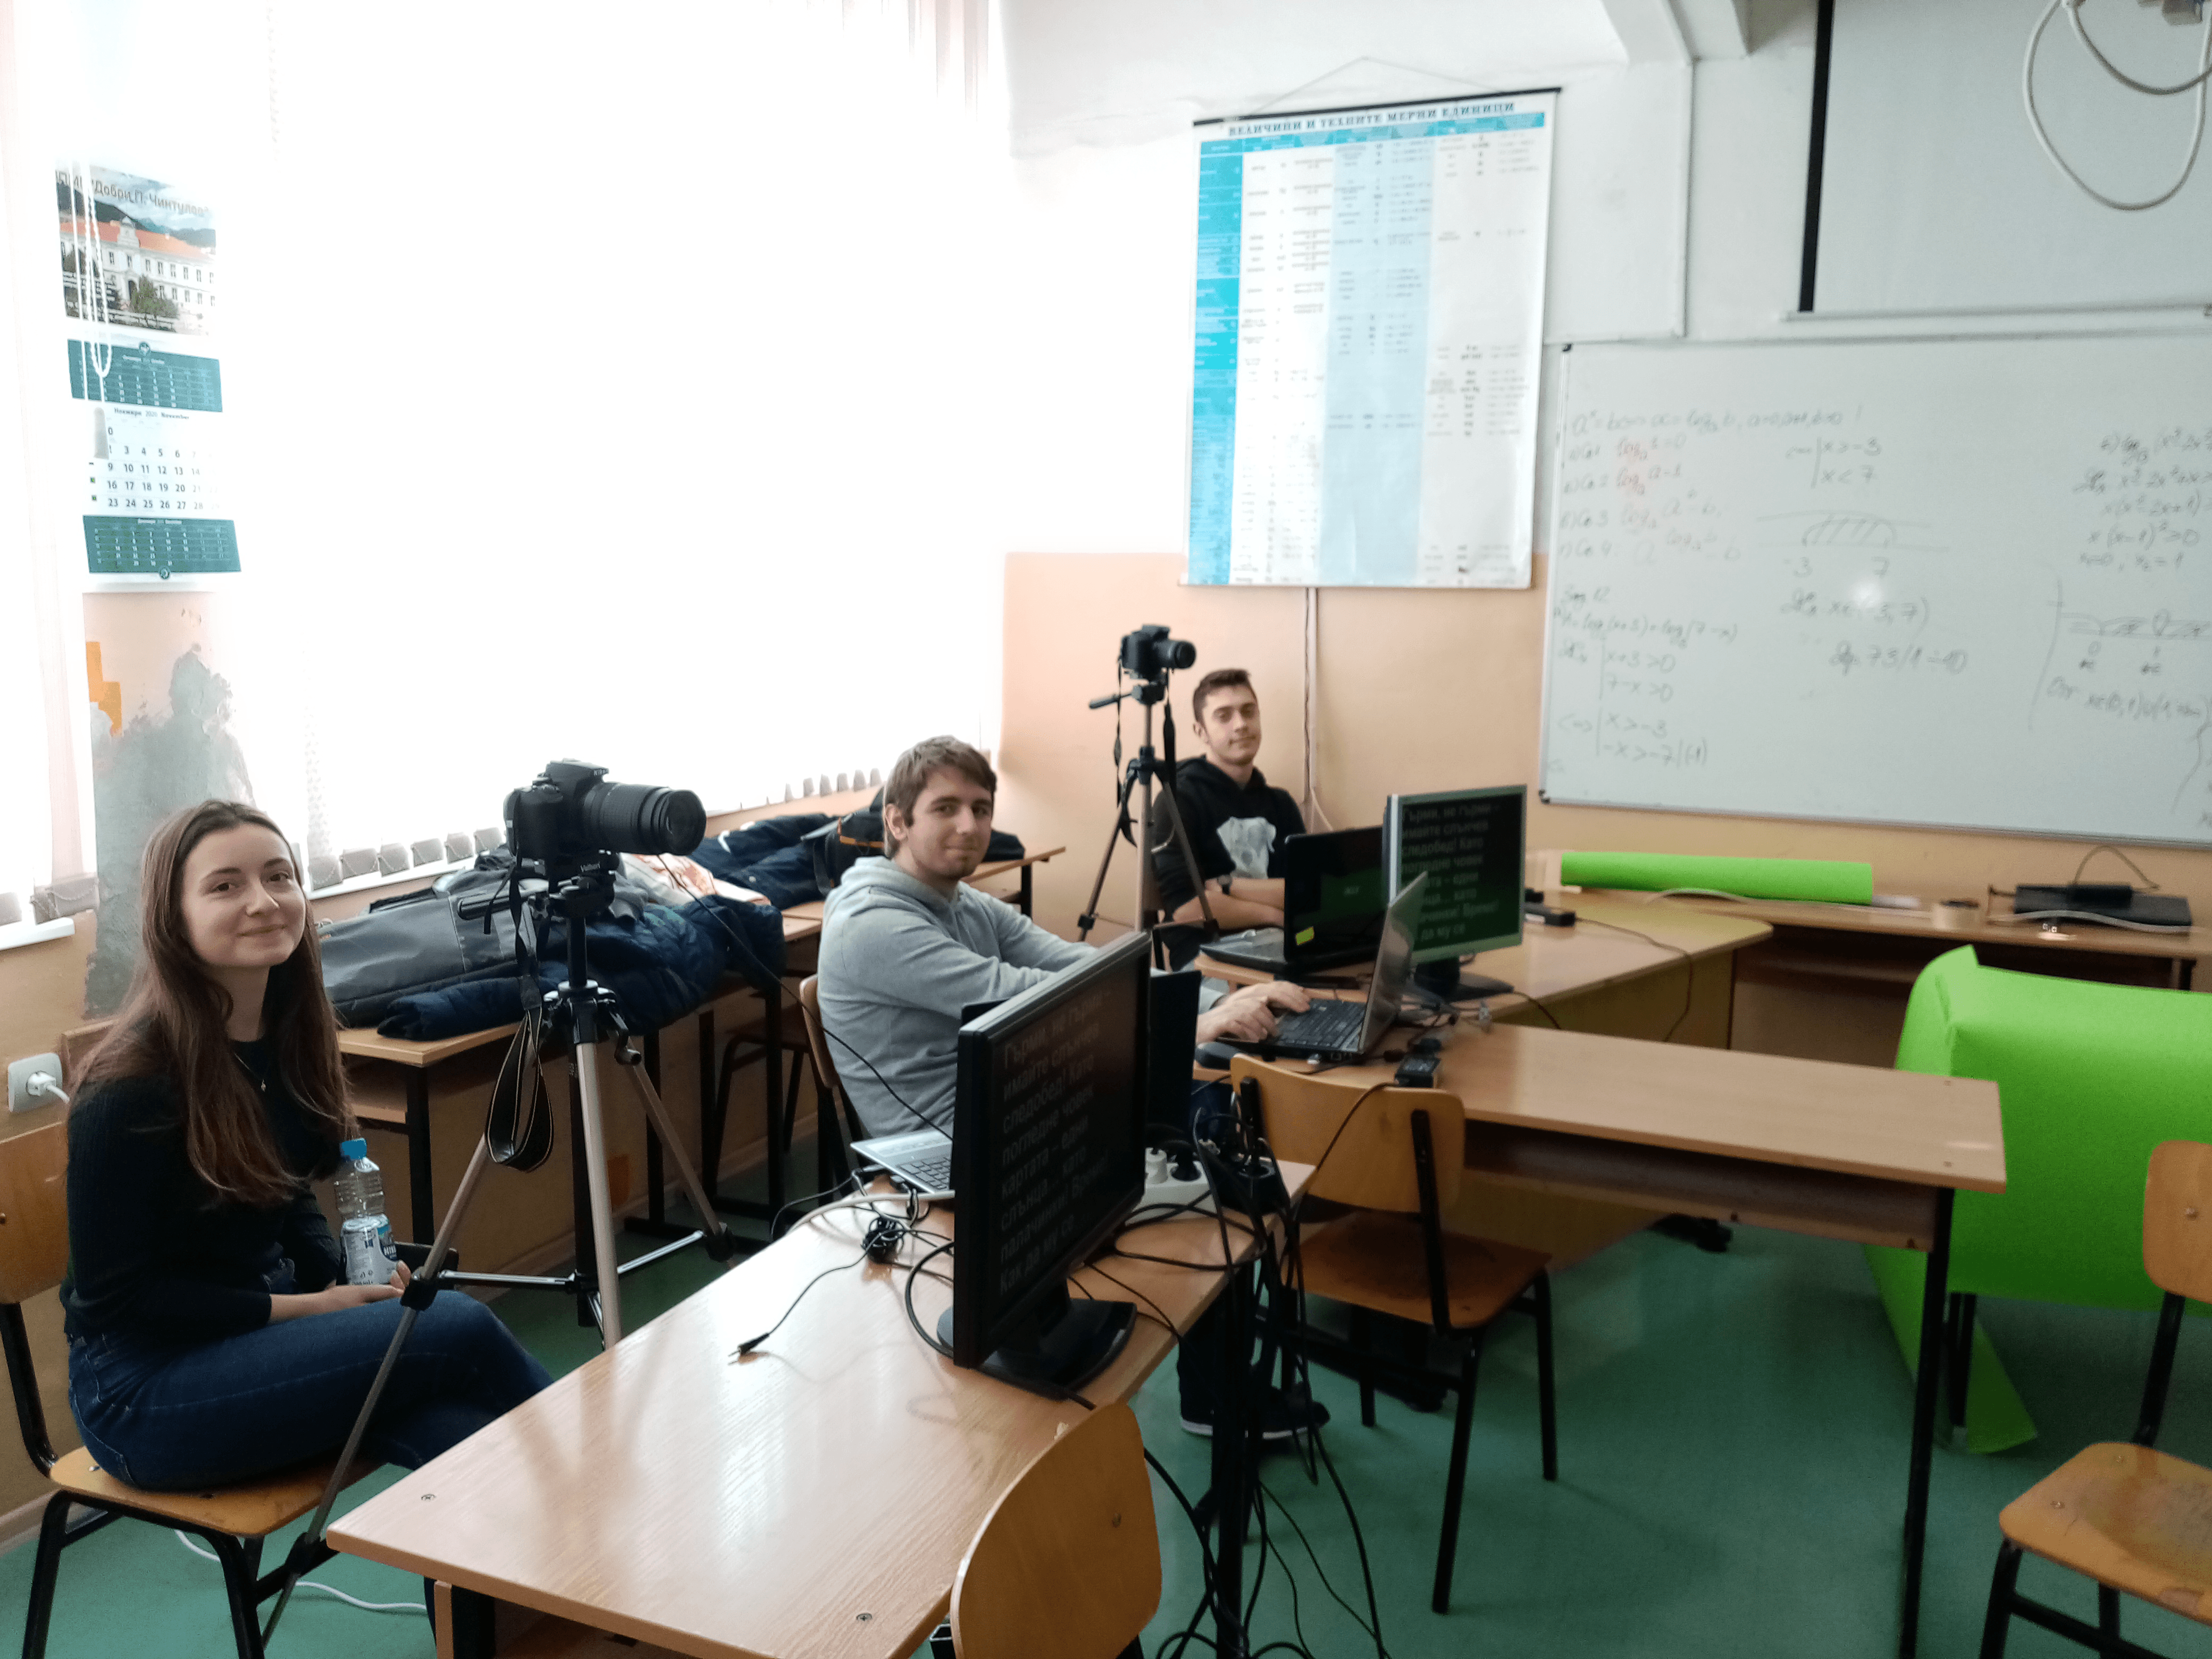 Slide 3 - ППМГ ТВ Сливен - Един ден на снимачната площадка